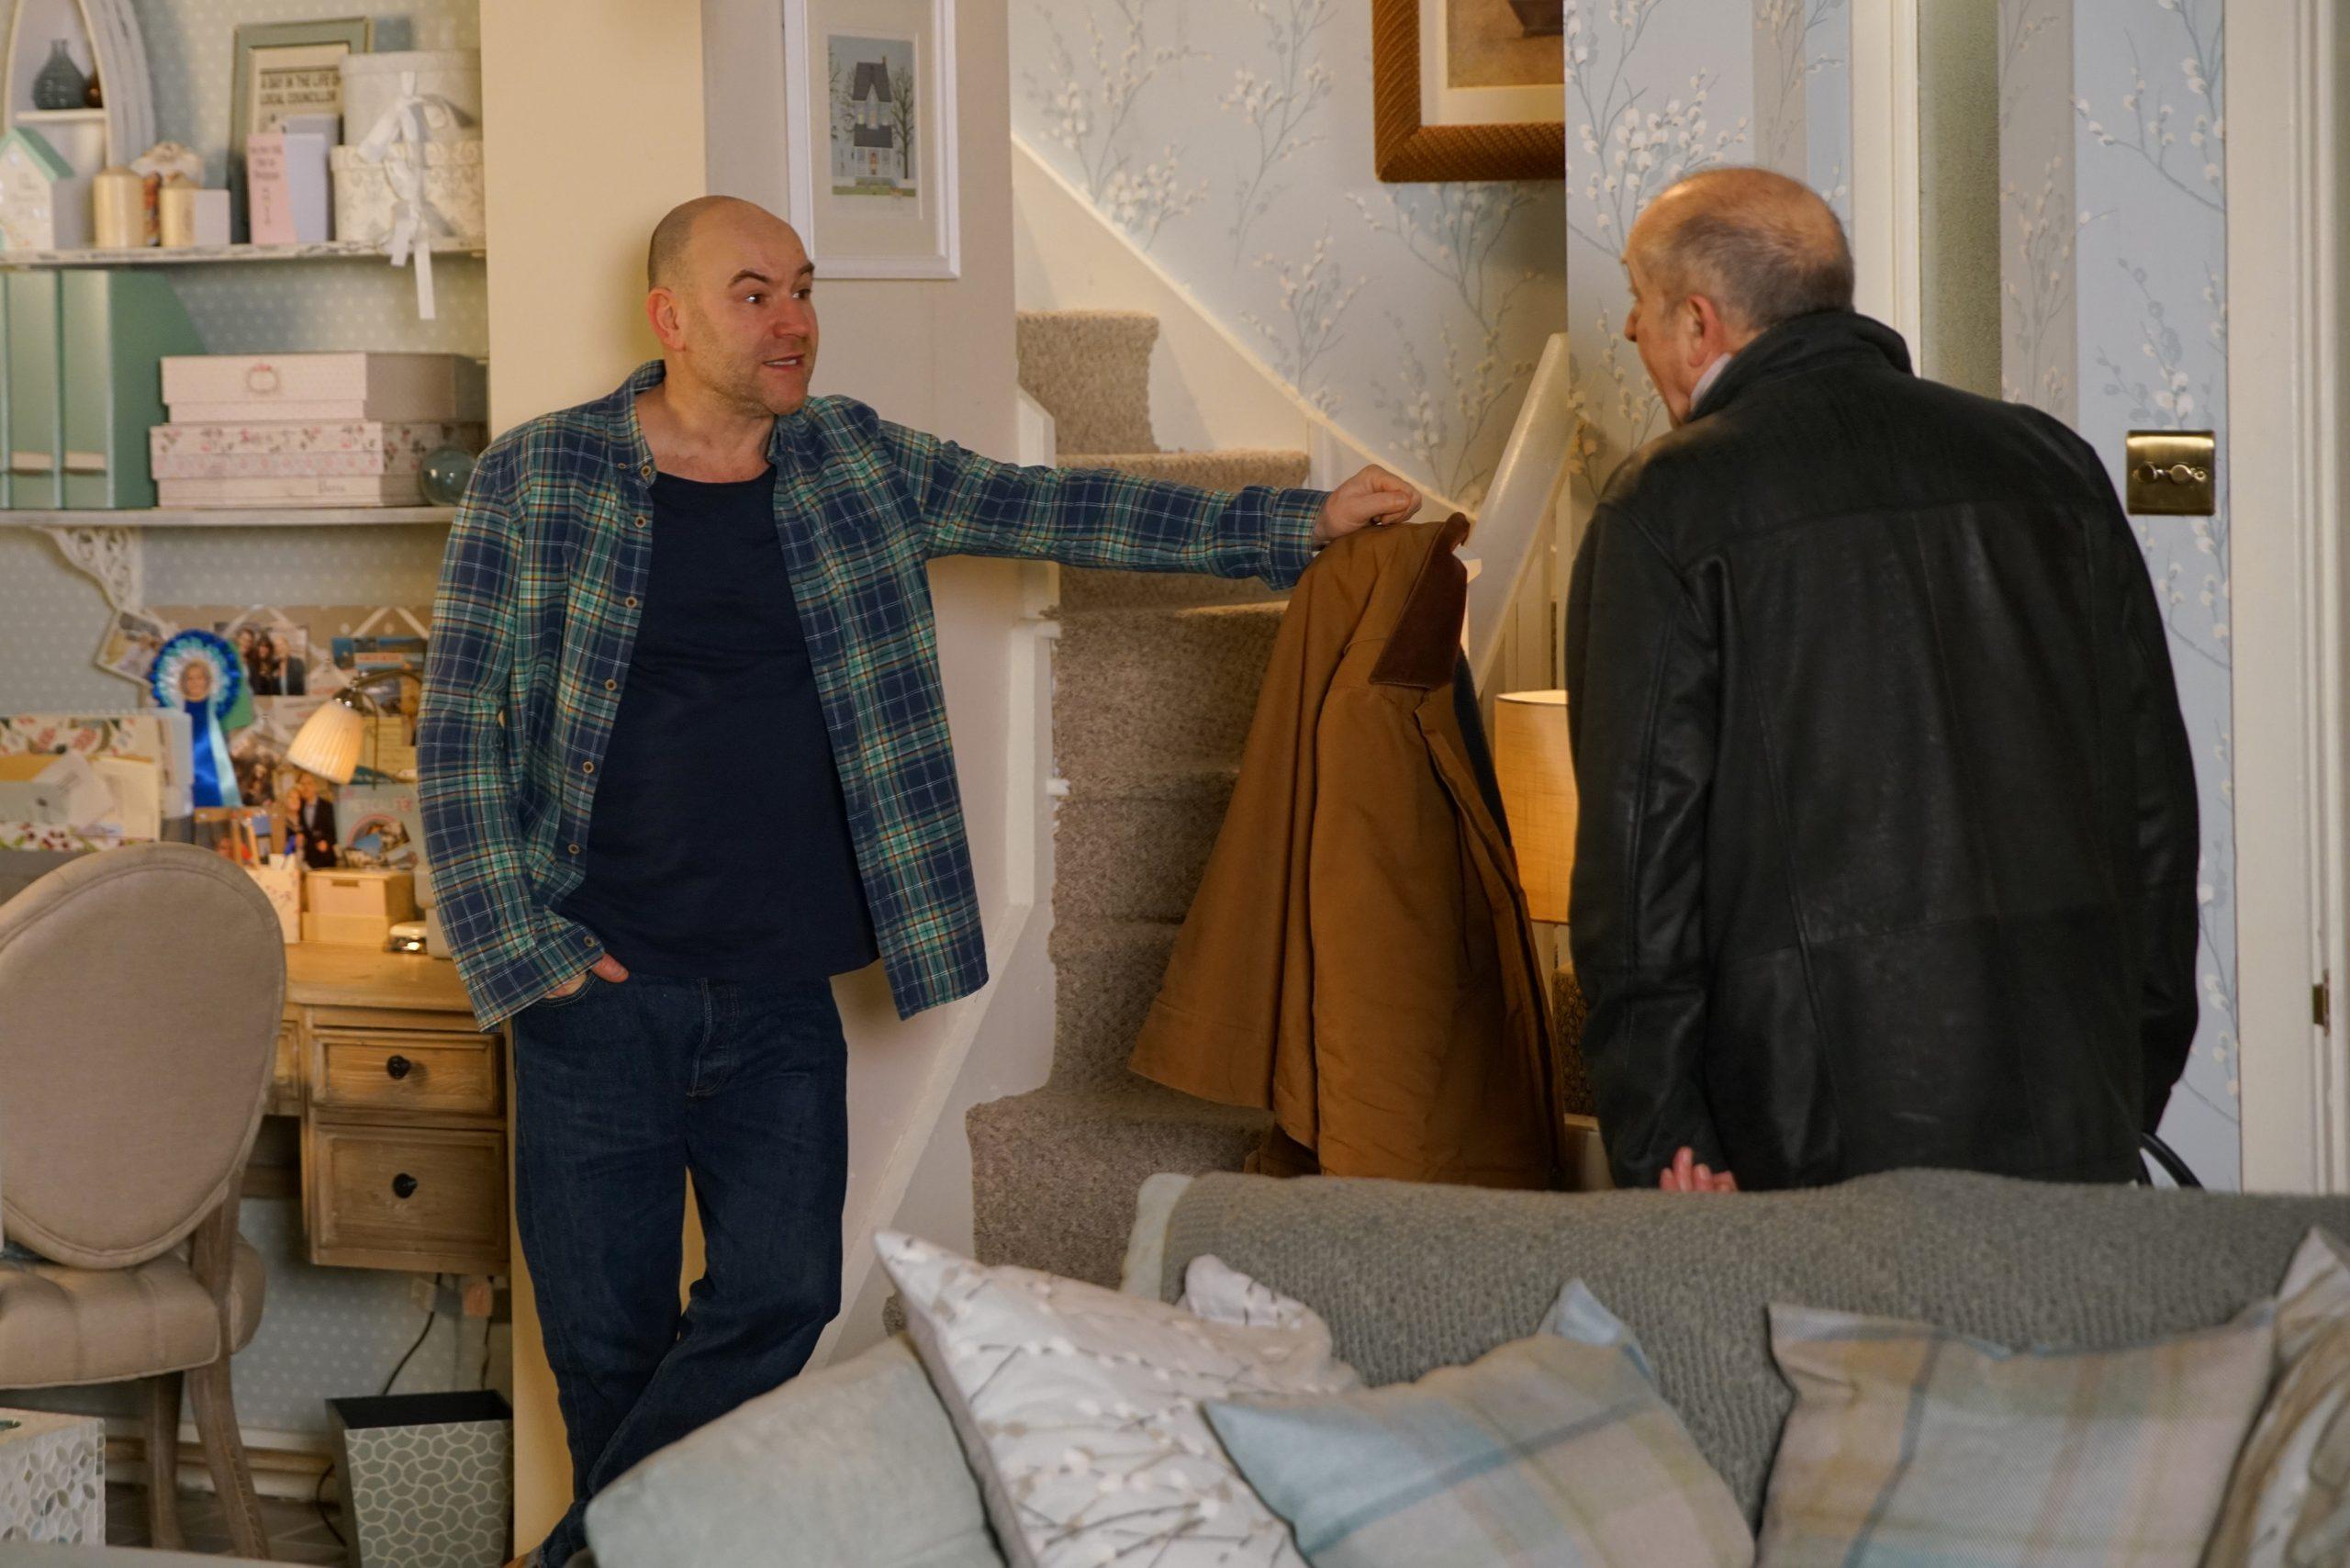 Coronation Street spoilers: Tim Metcalfe chucks his dad out!